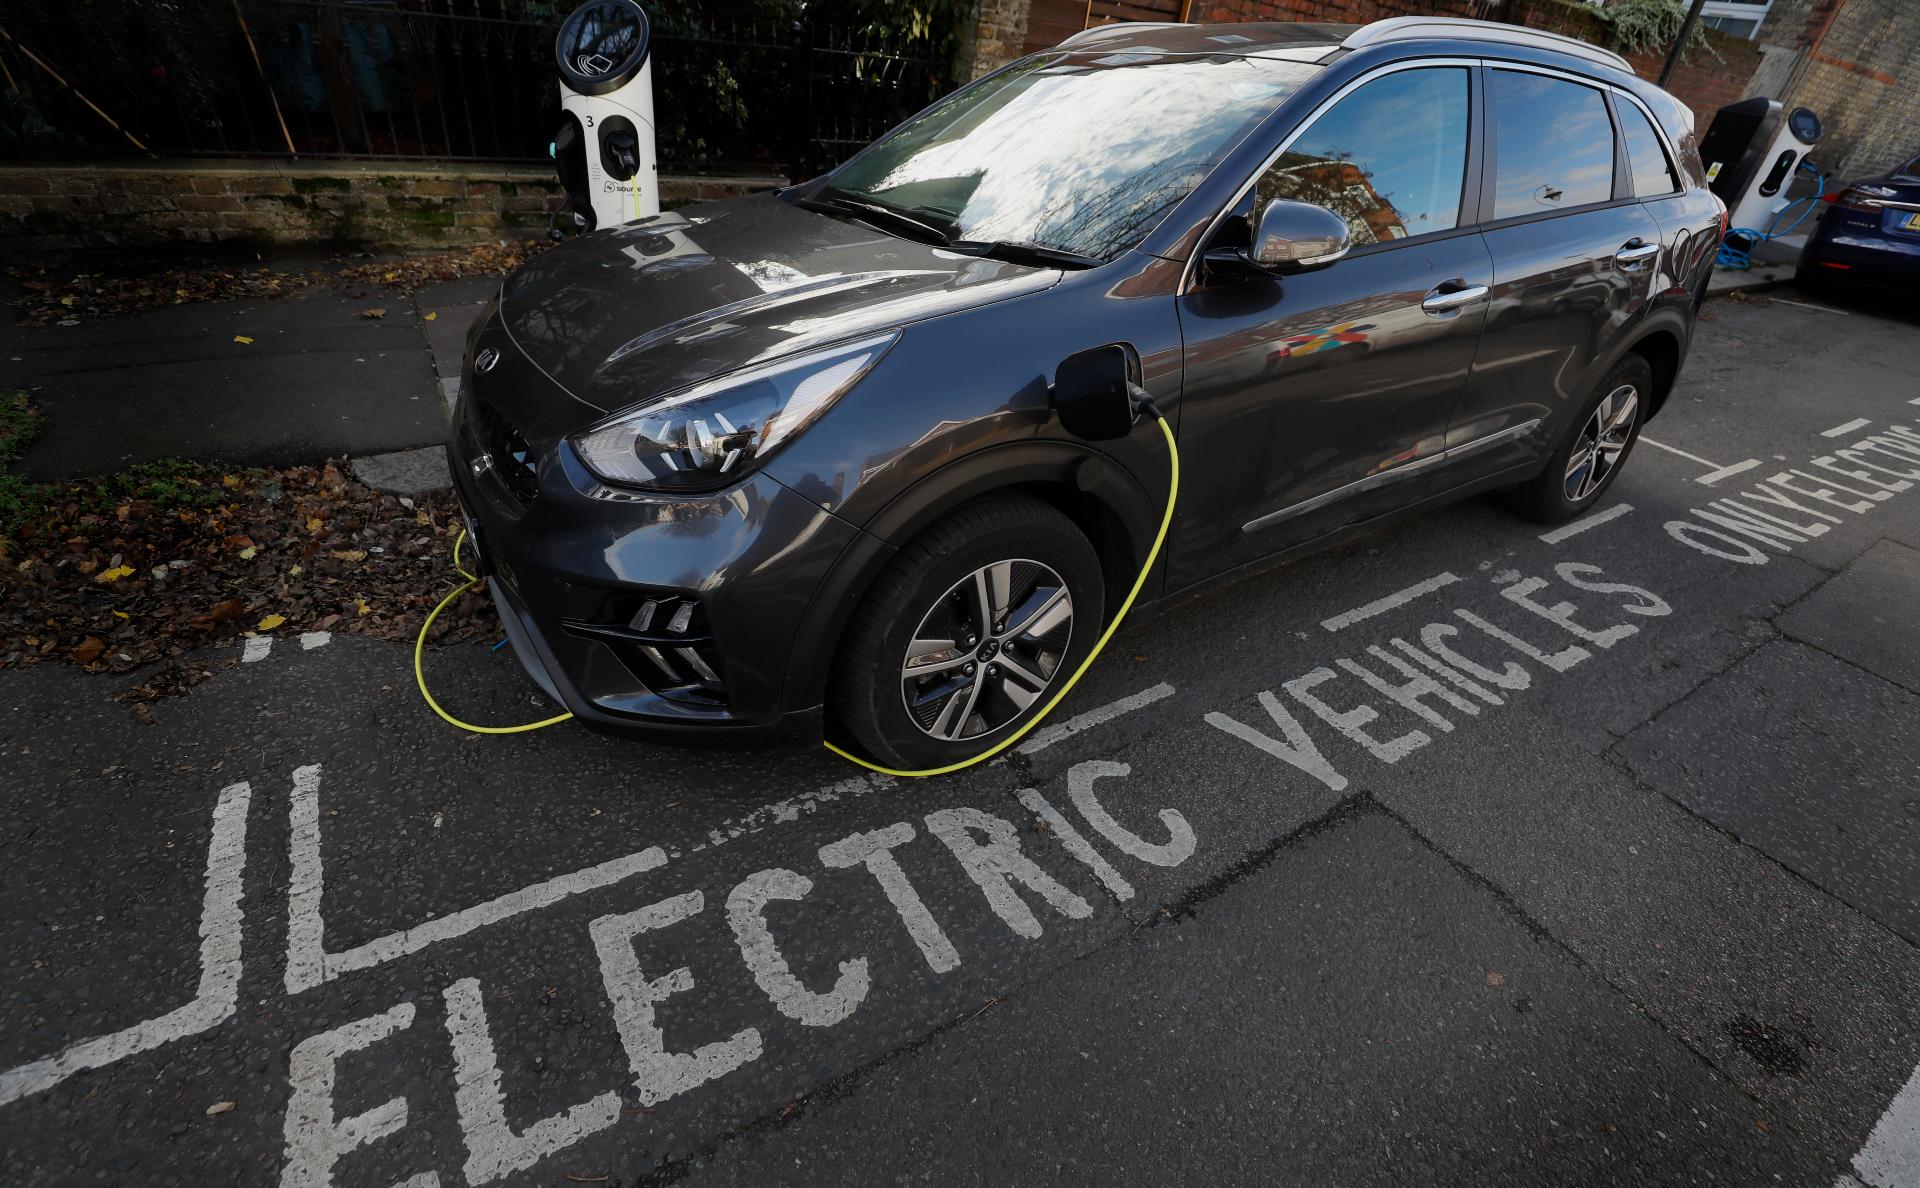 Привлекший инвестиции Абрамовича стартап создал батареи для электрокаров